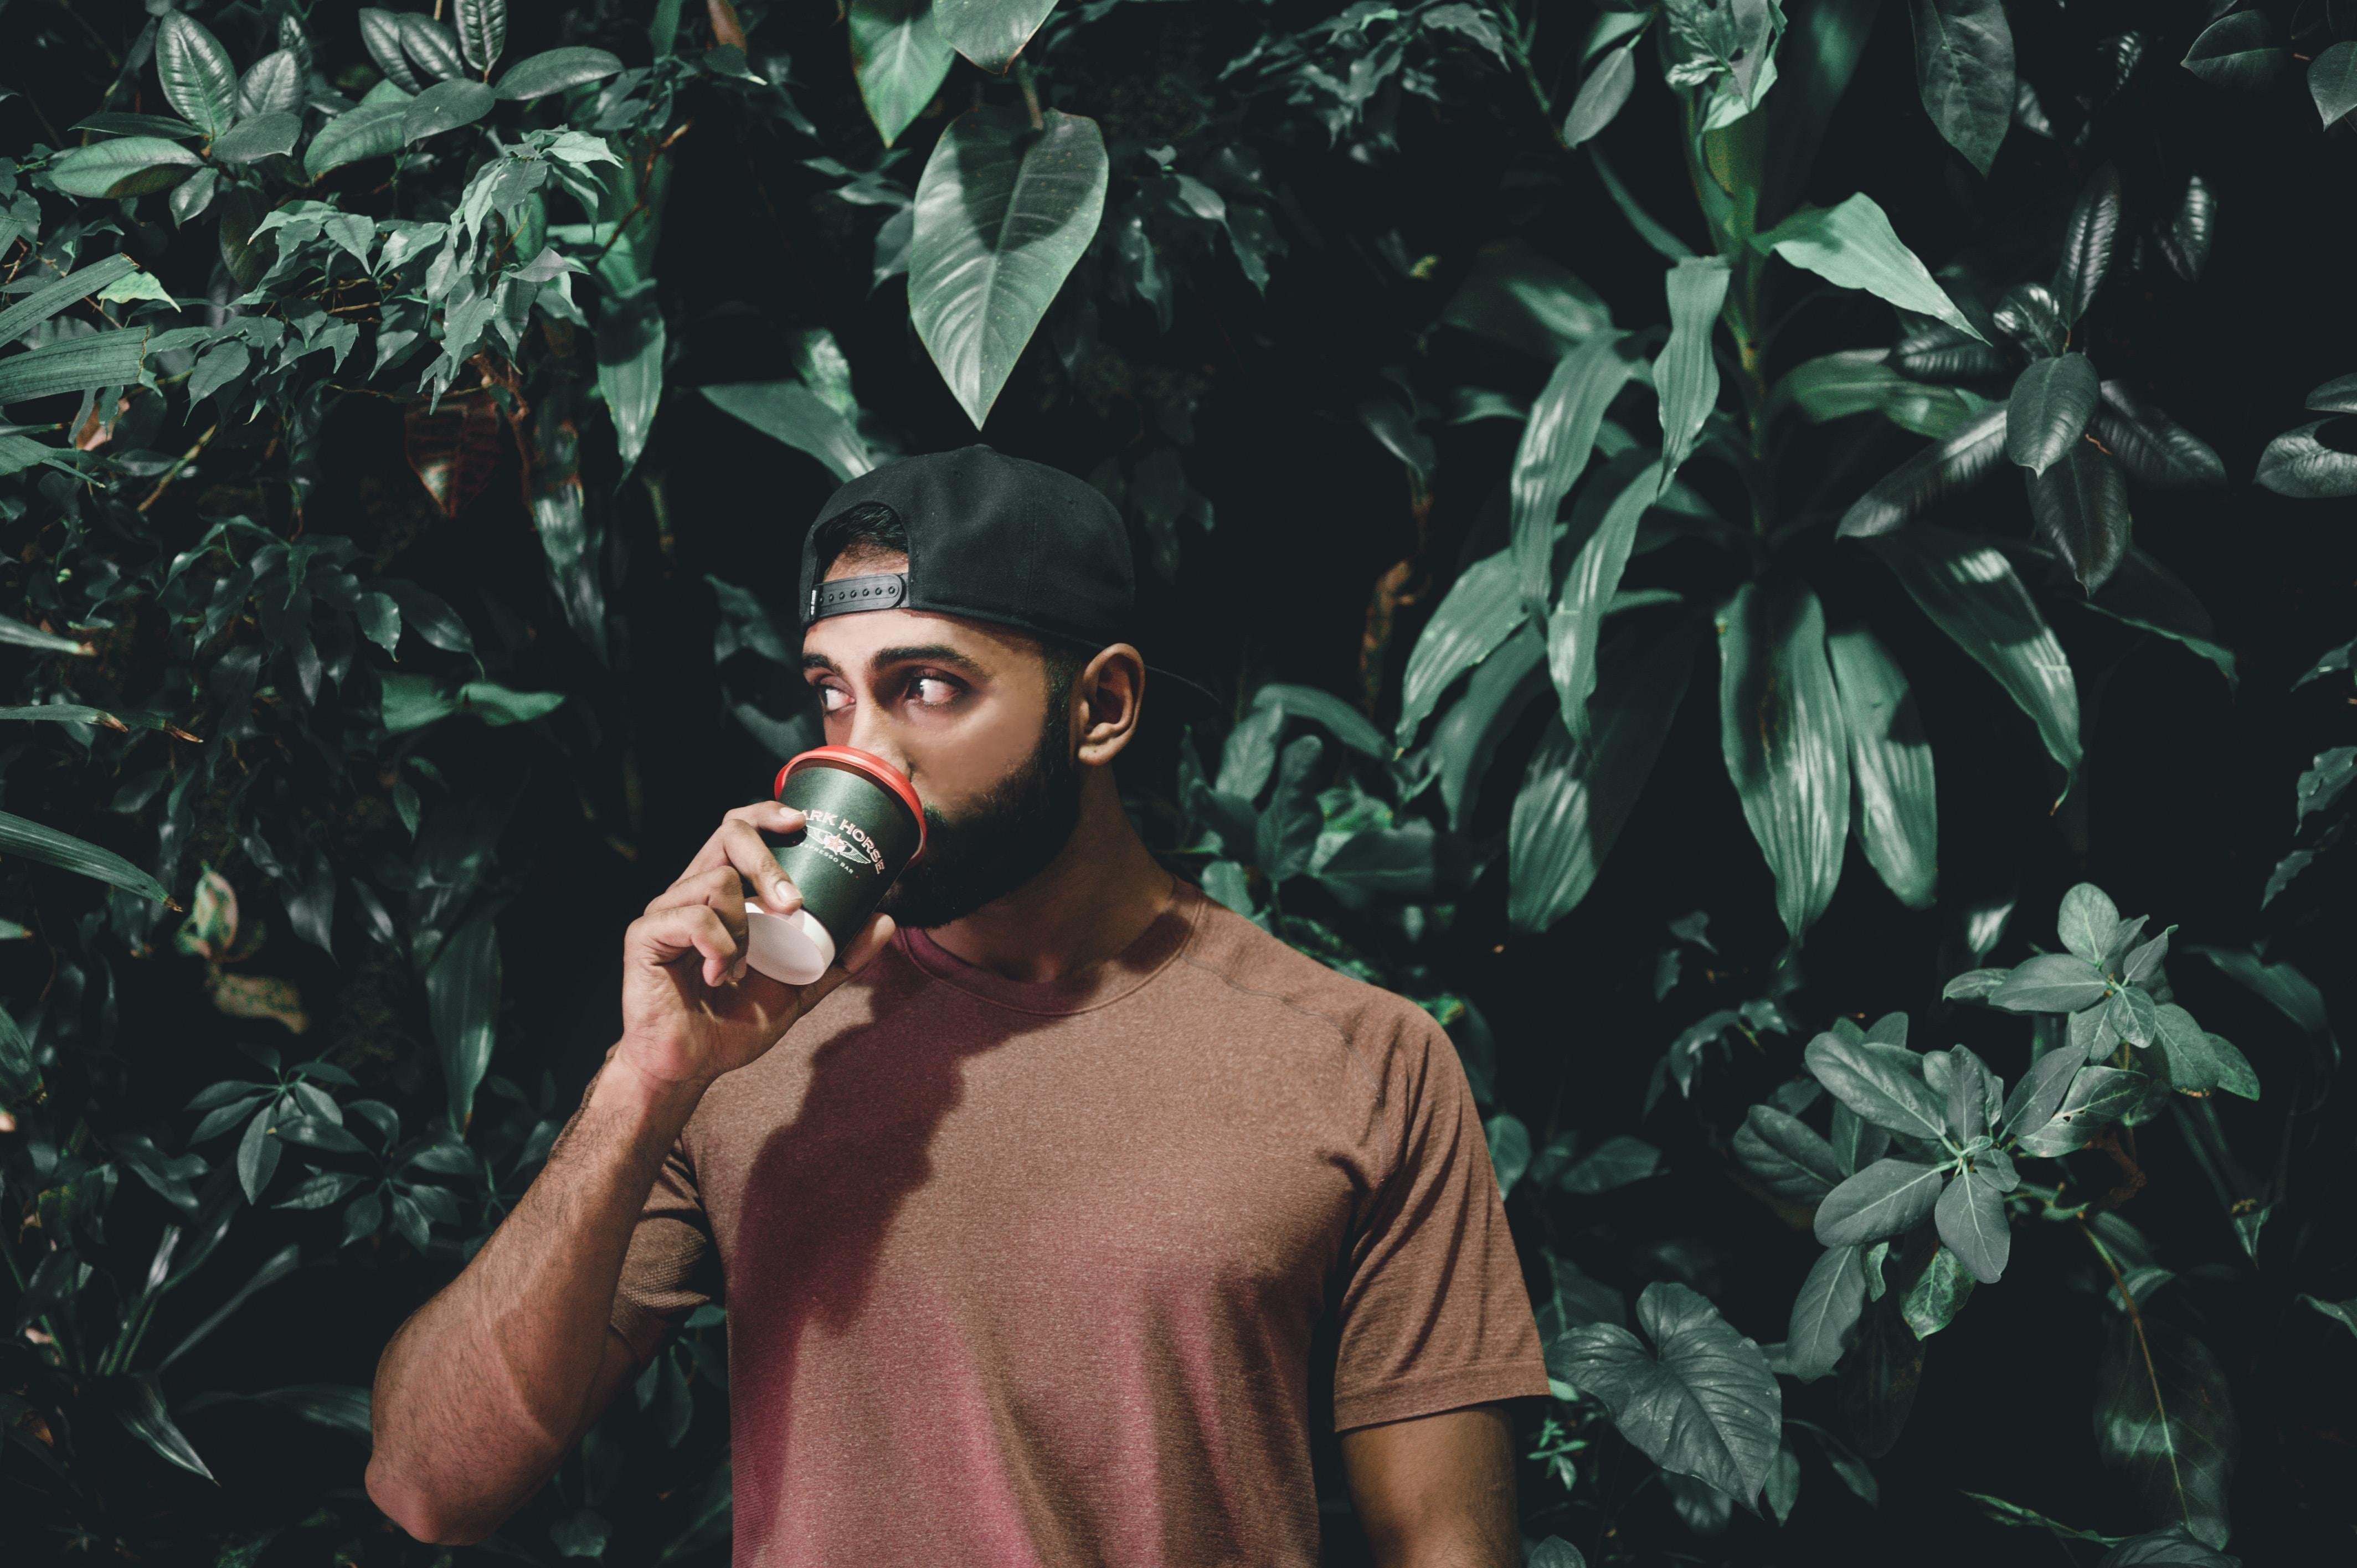 man drinking behind green leafed plnats